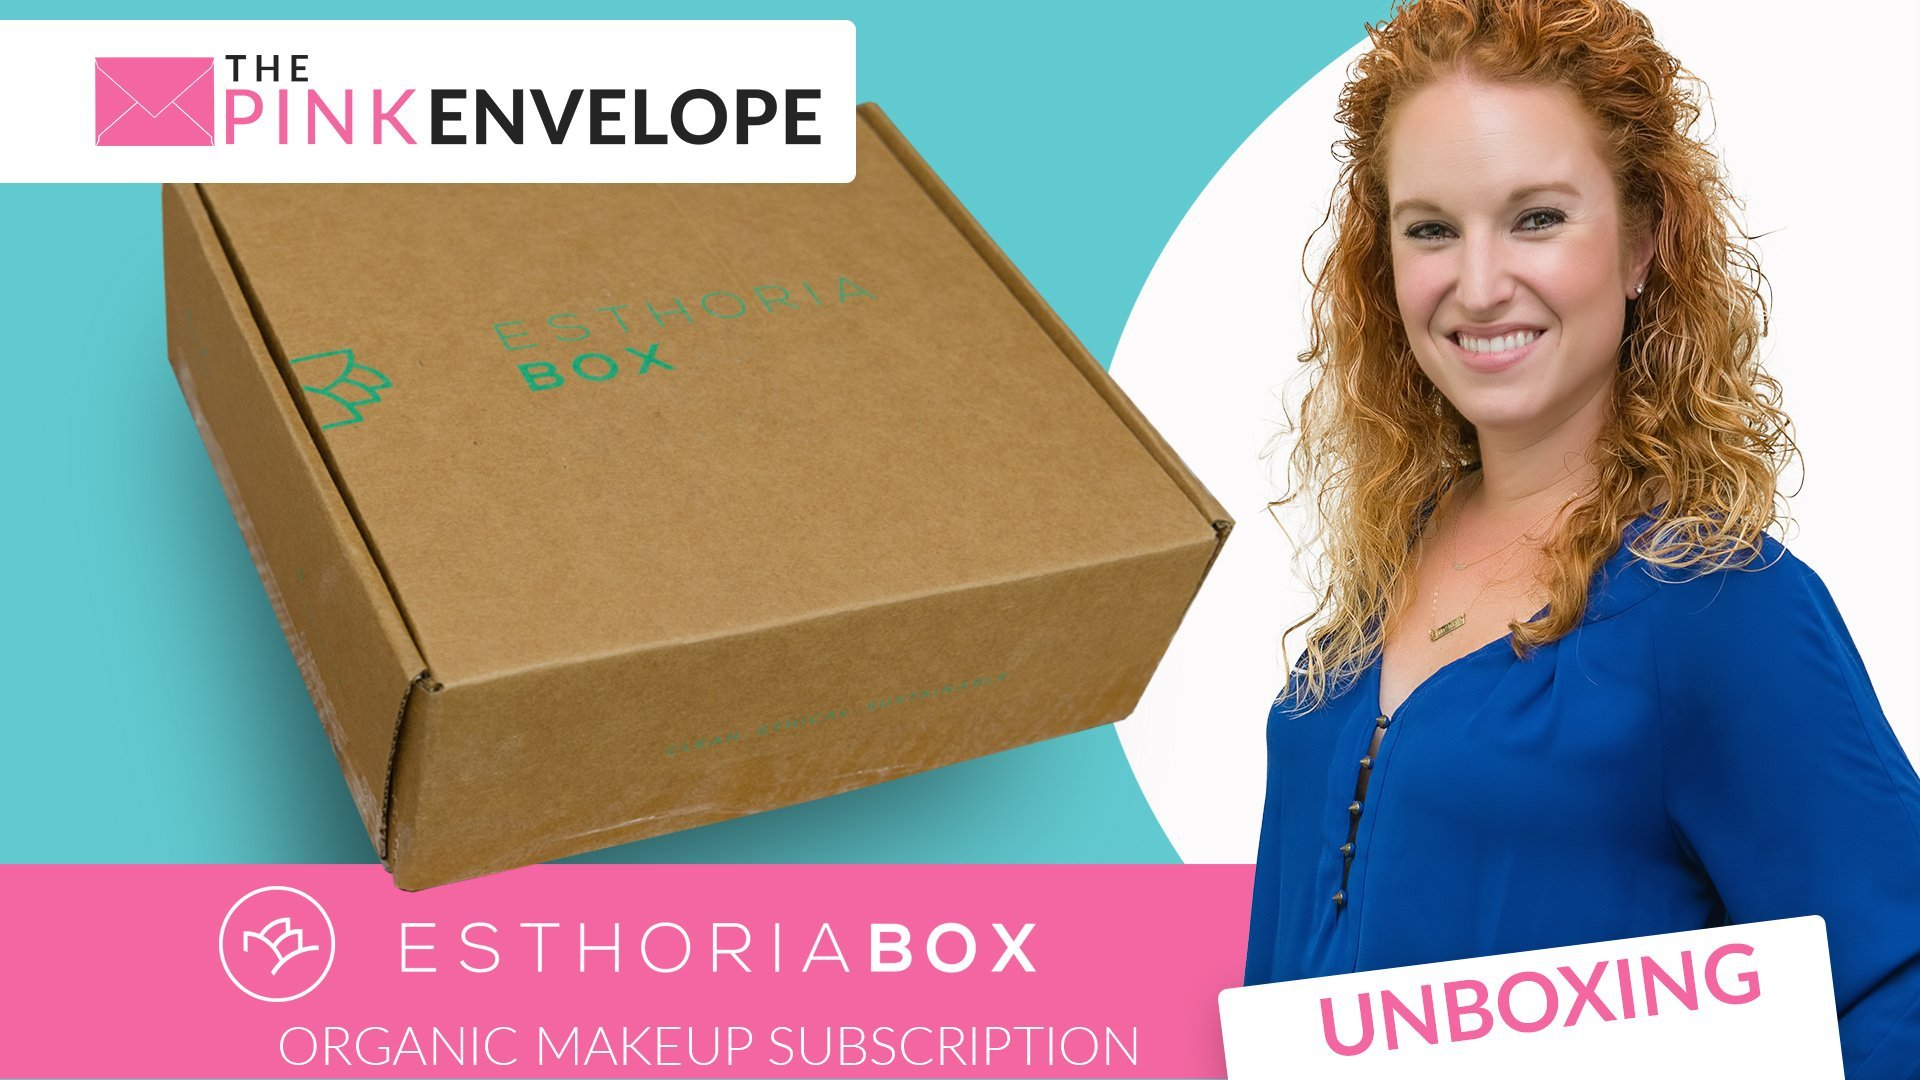 Esthoria Box Review – Organic Makeup Subscription